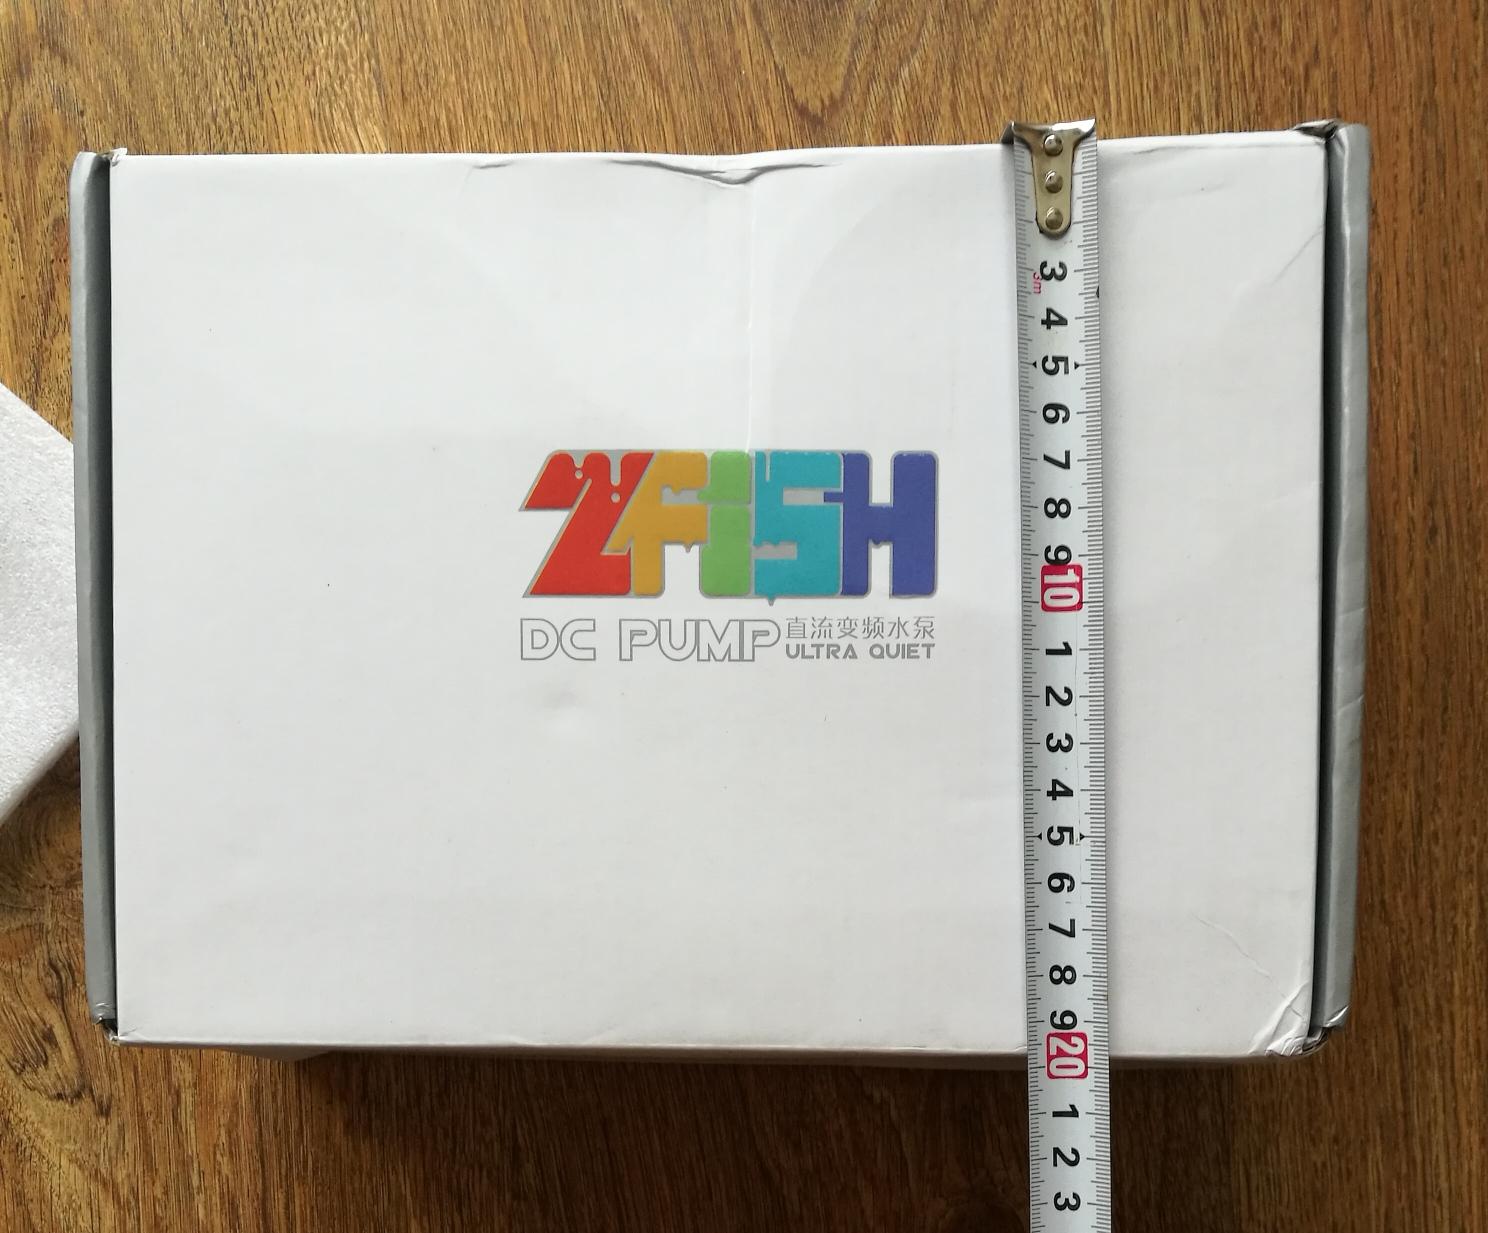 ZFISH变频水泵试用报告 北京龙鱼论坛 北京龙鱼第2张